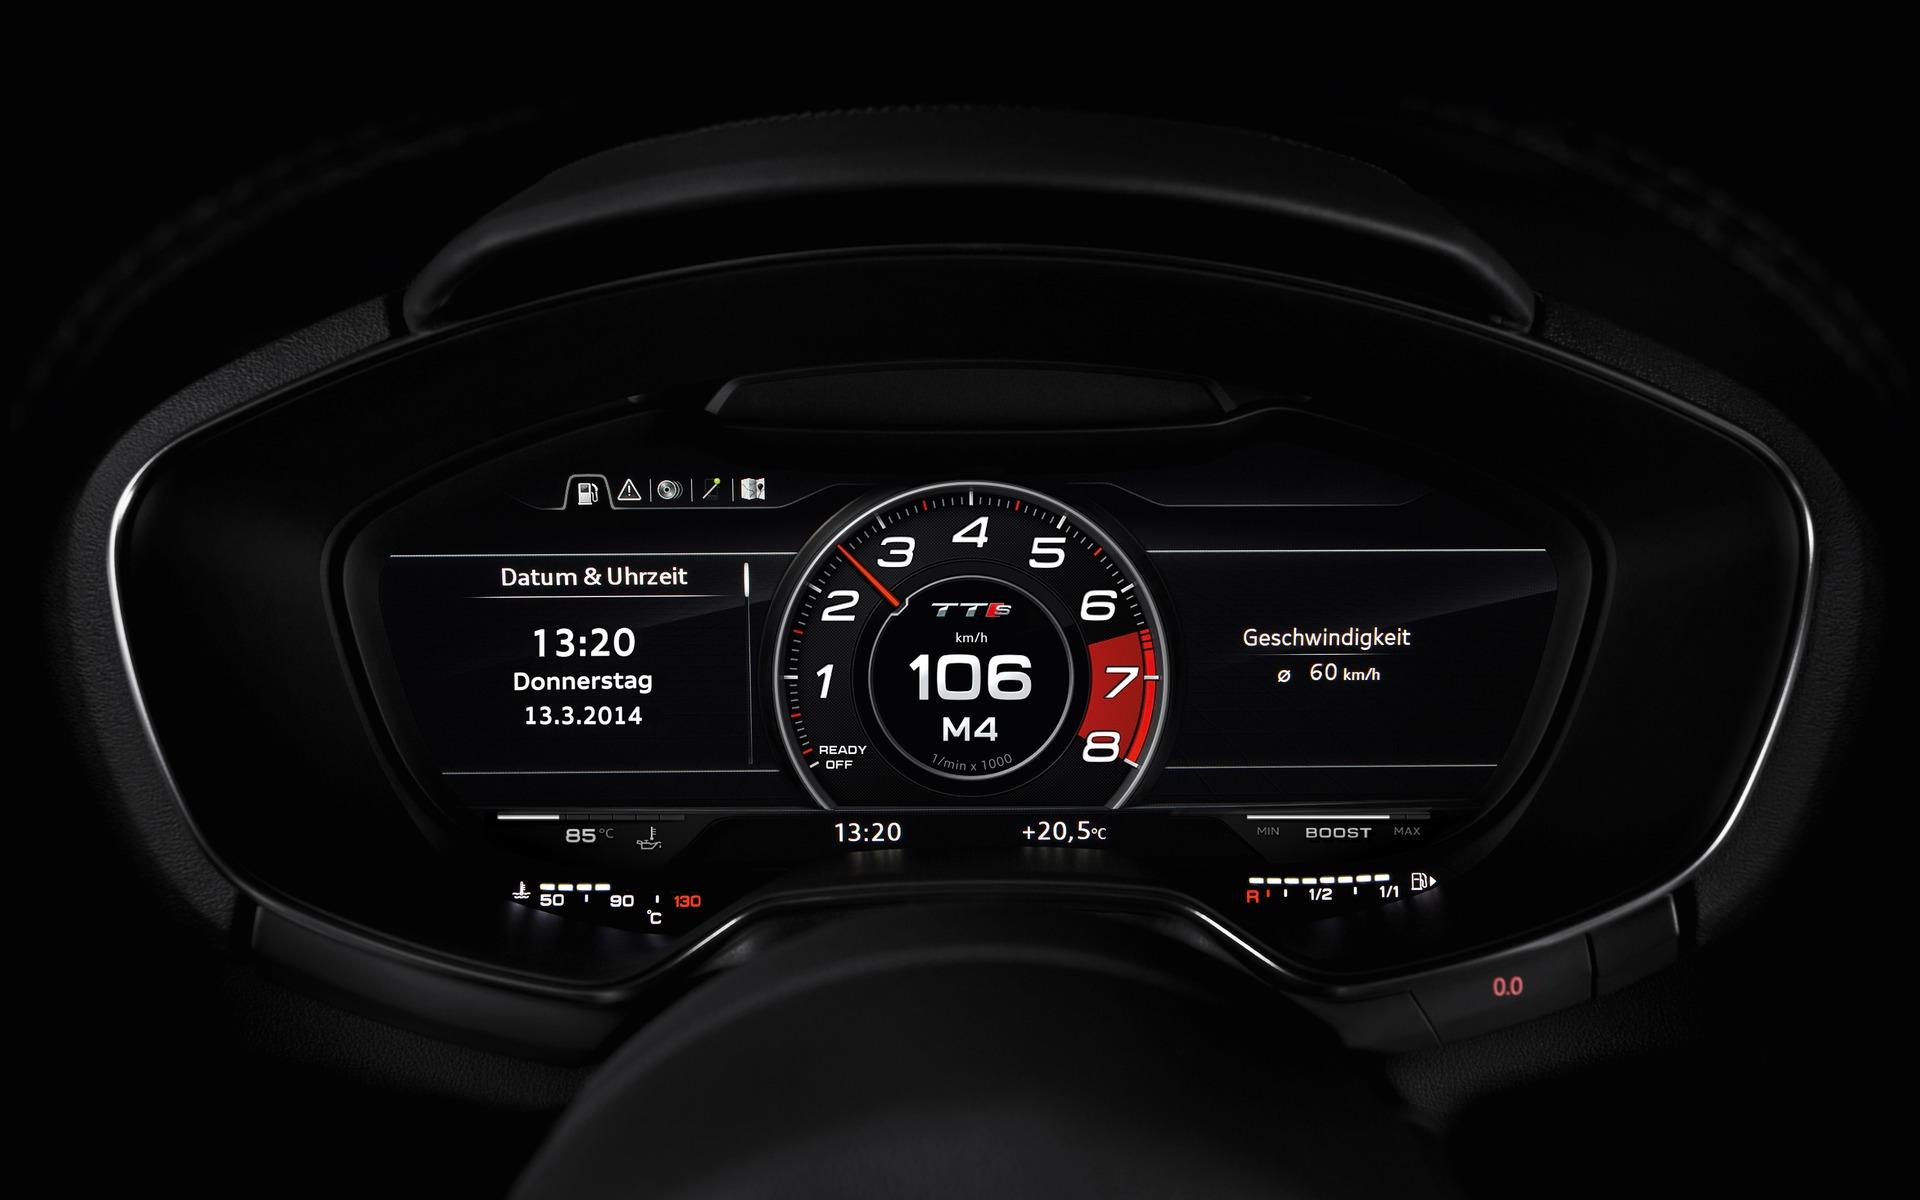 Audi Virtual Cockpit - A New Approach for Interior Design - 14/14